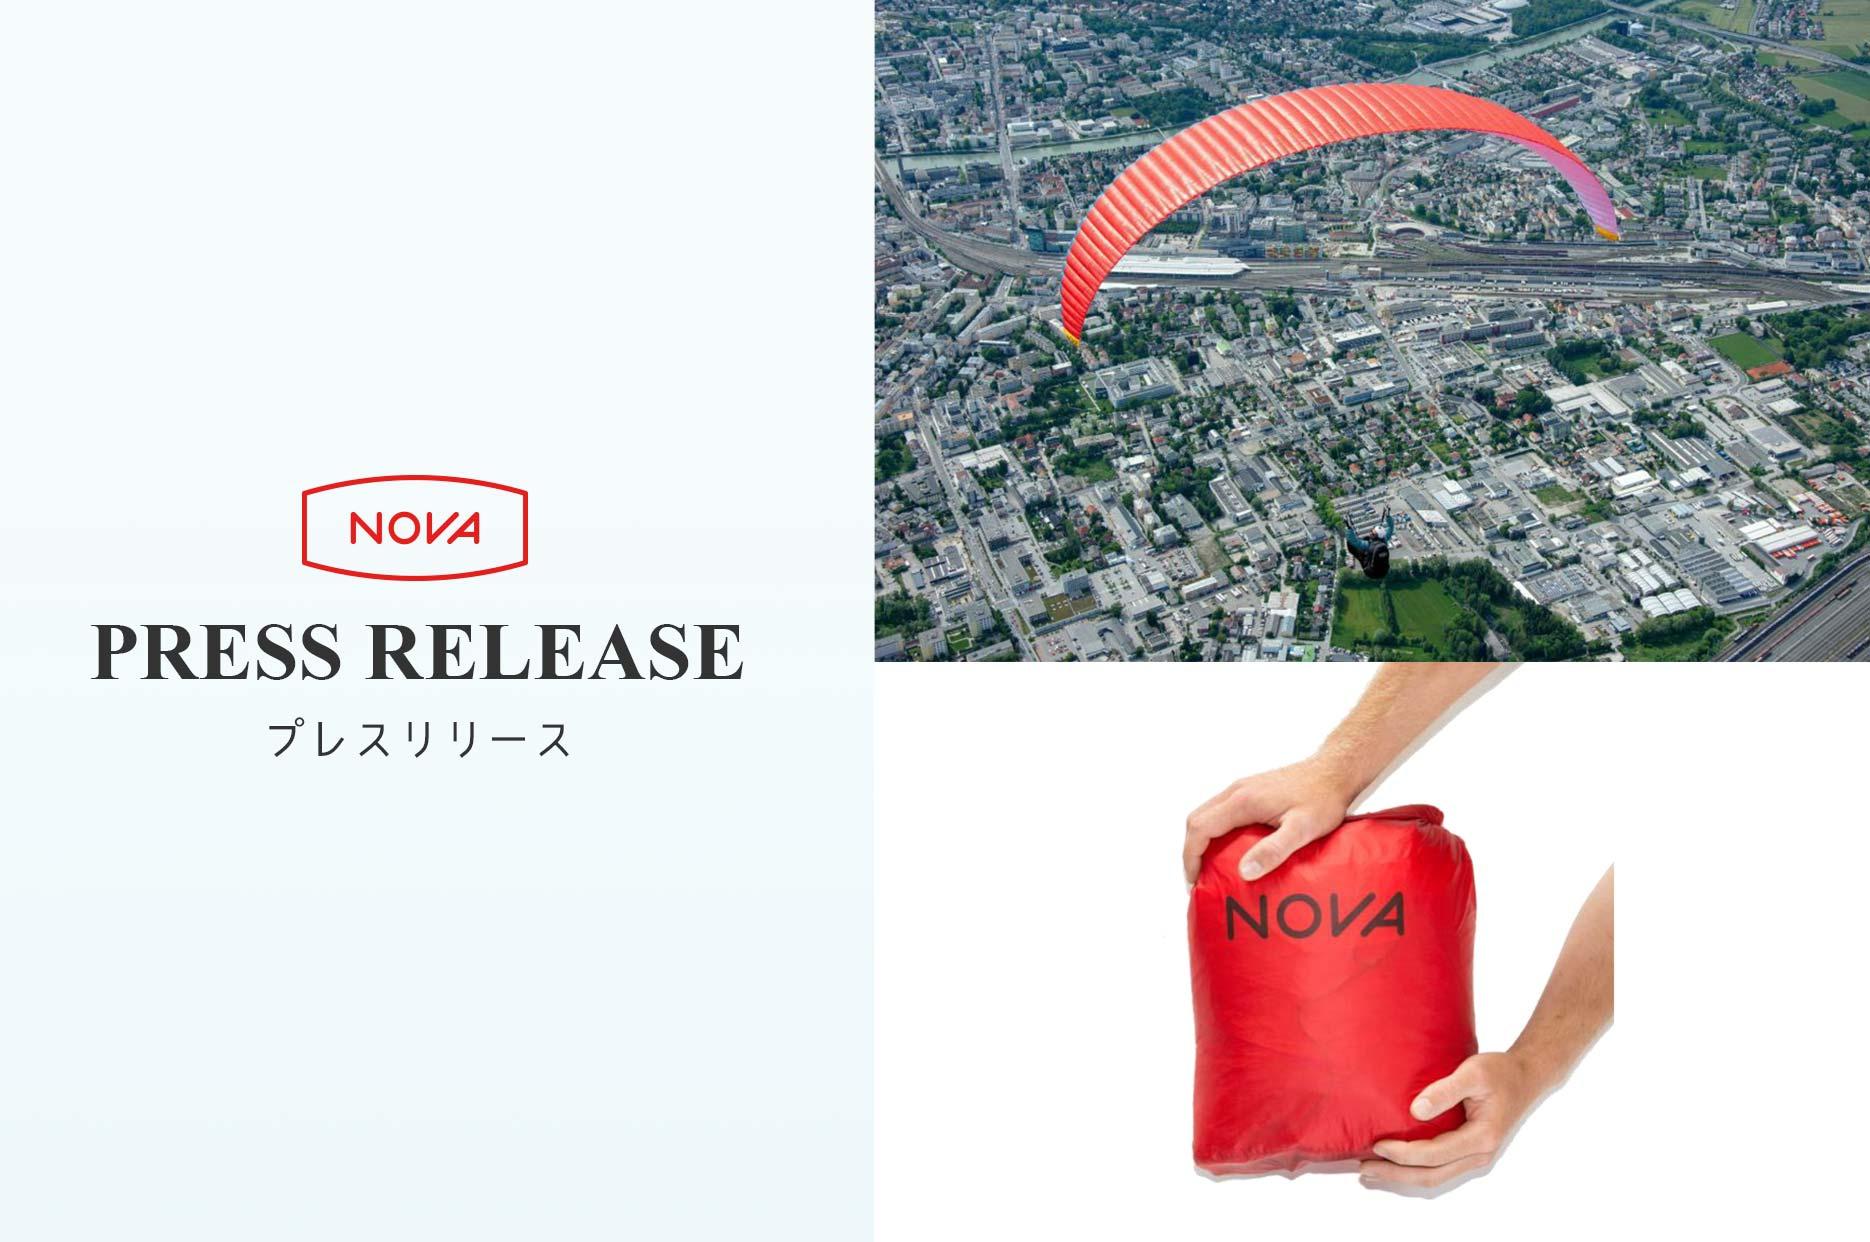 NOVAプレスリリース「メンター6ライトXXXSサイズ 受注開始」